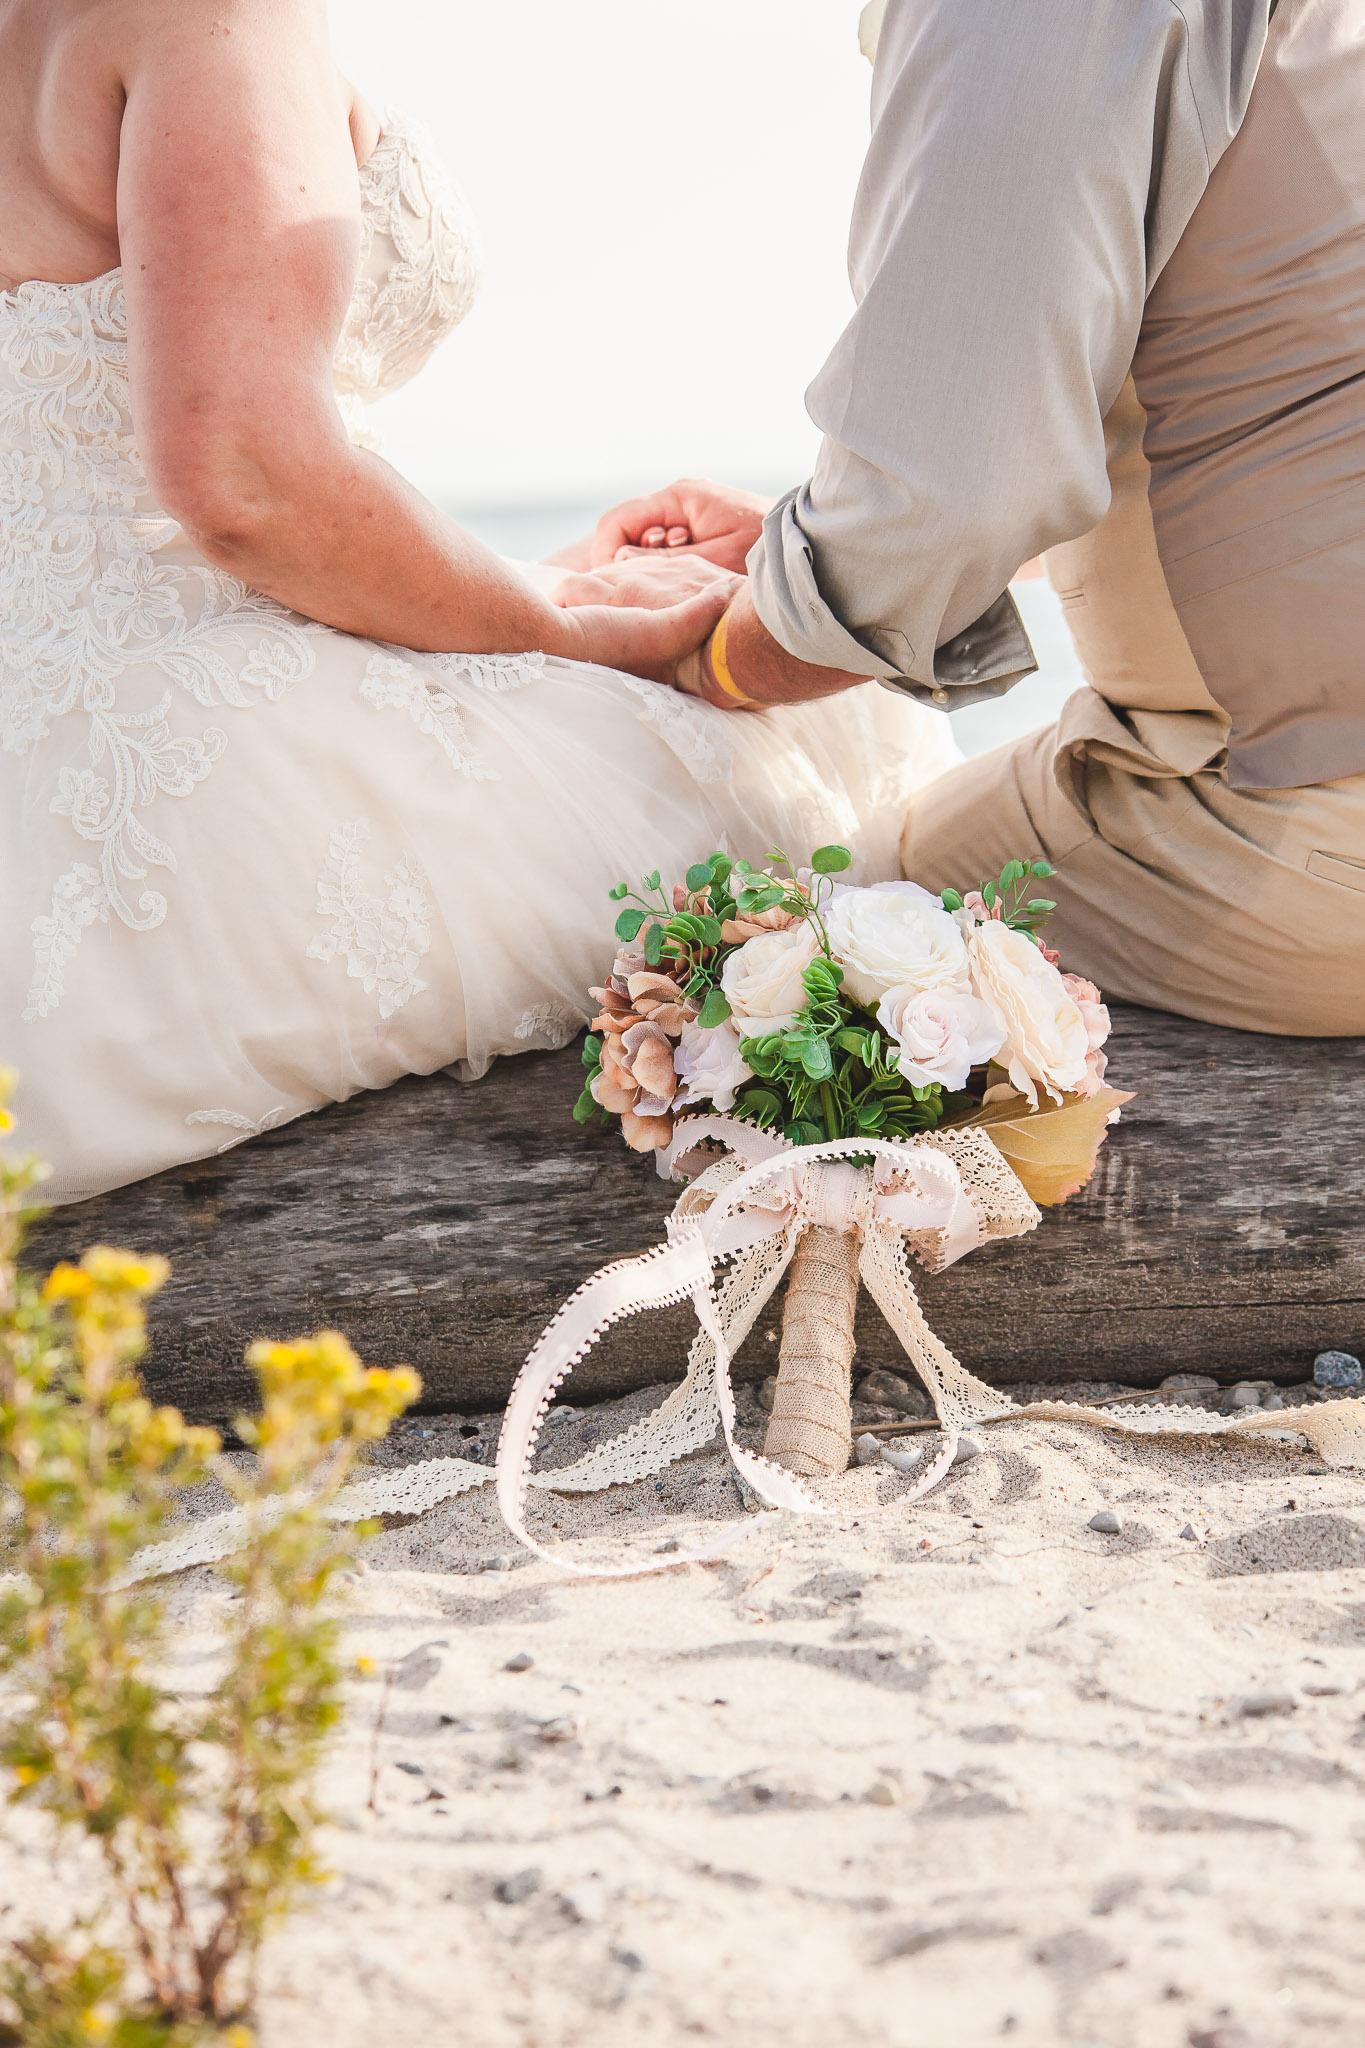 Barrie & Muskoka Wedding Photography Amy D Photography_-944.jpg